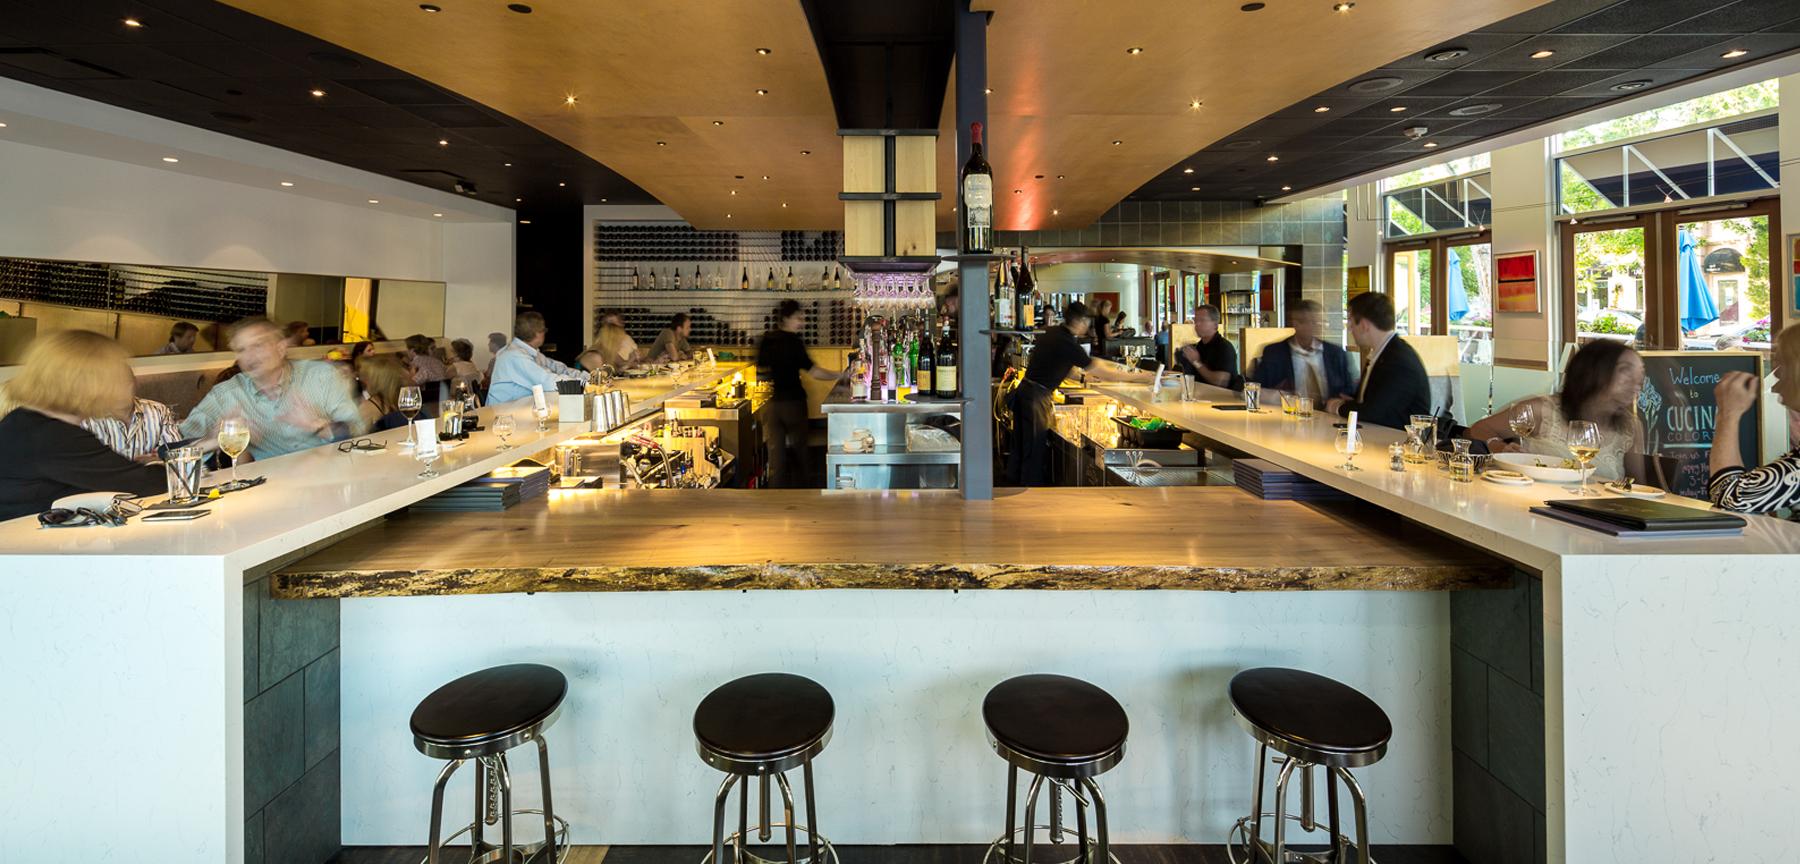 Cucina Colore restaurant bar area